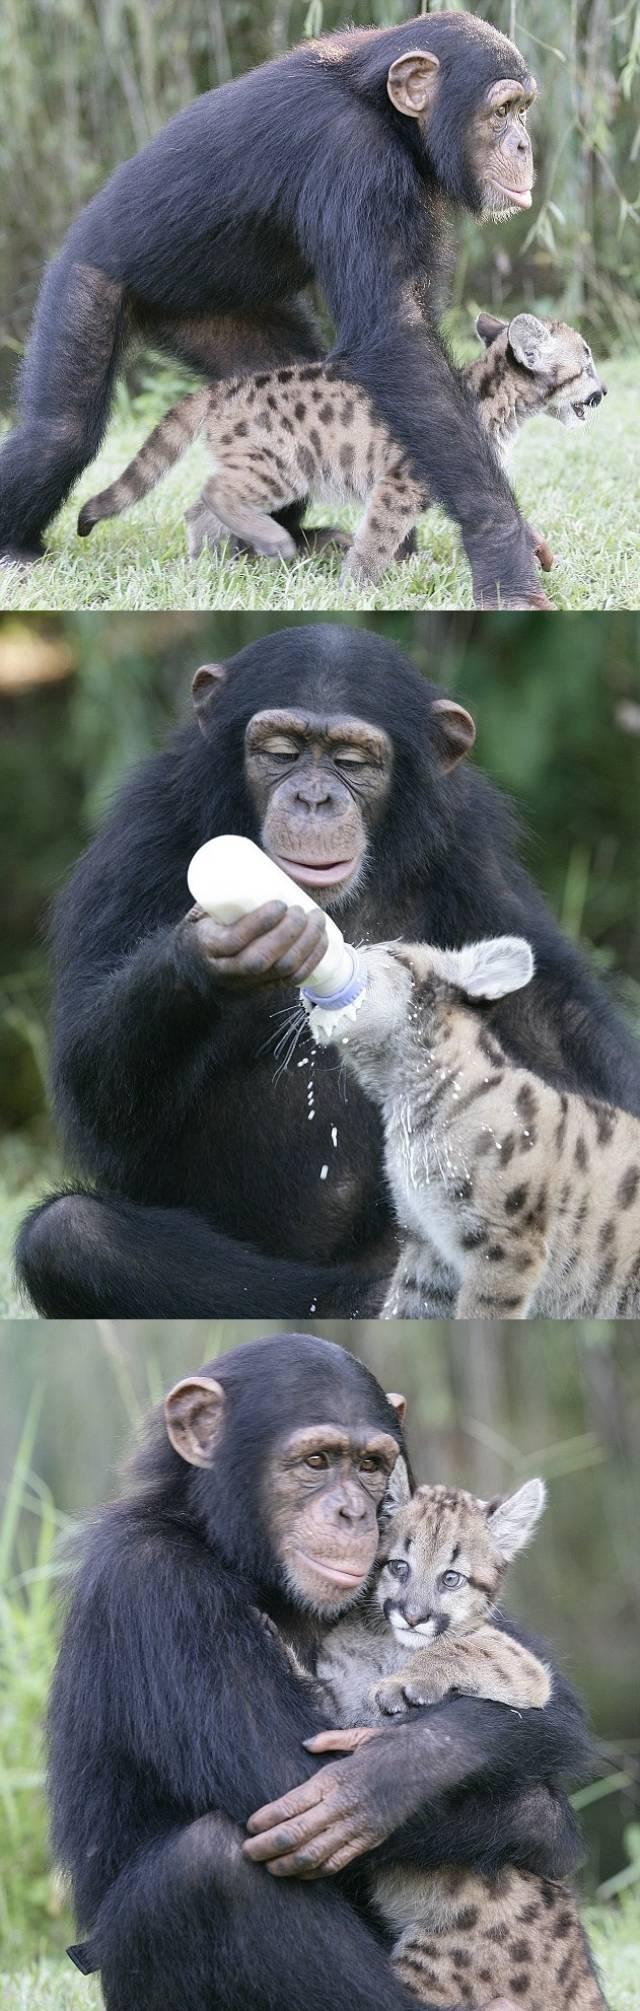 Chimpanzee Raises Puma Cub